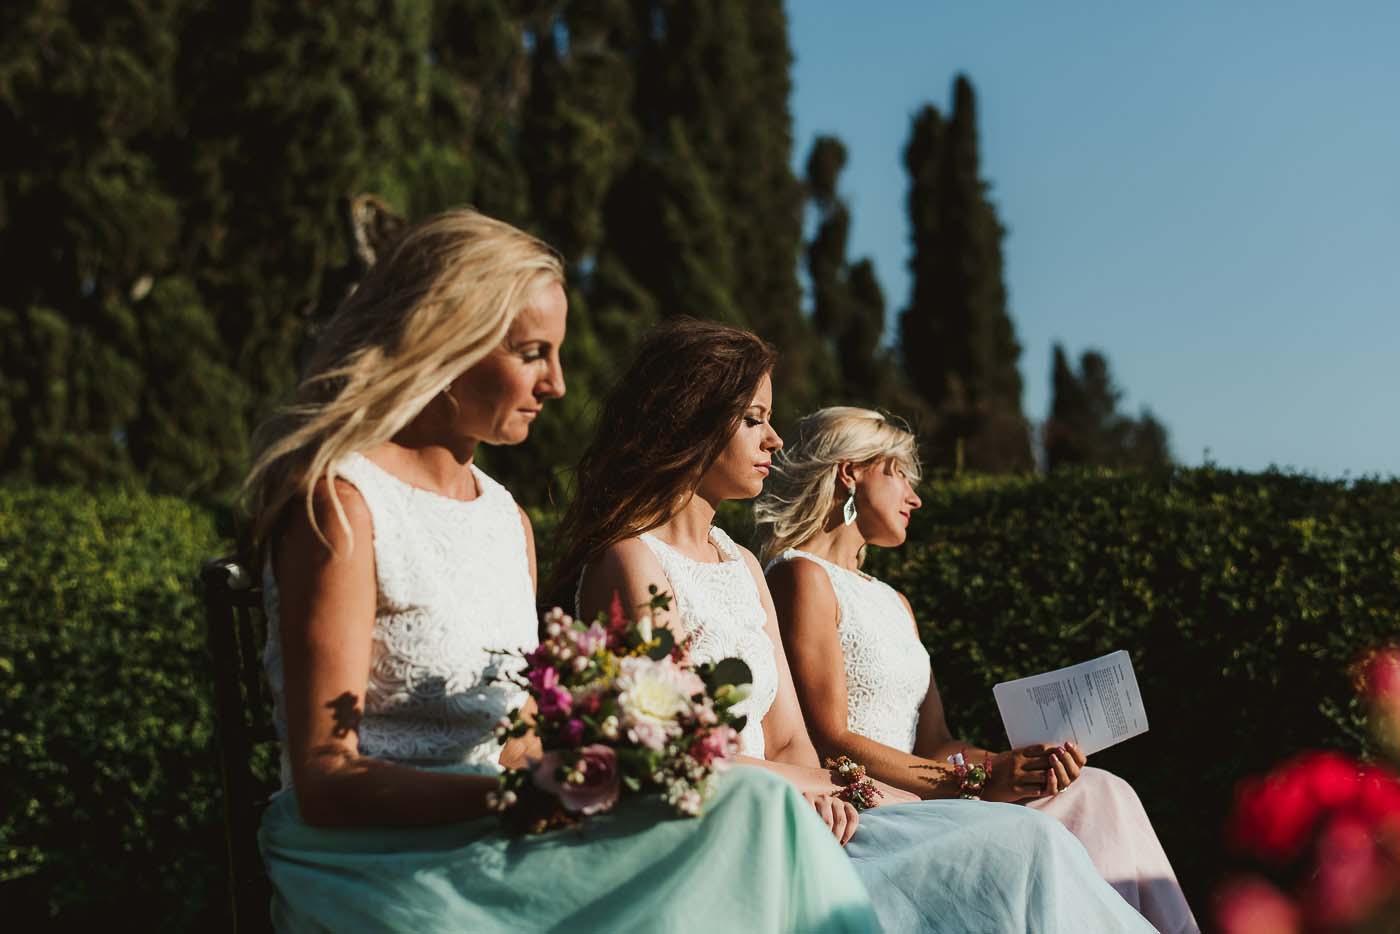 Relaxed-wedding-borgo-stomennano-1105